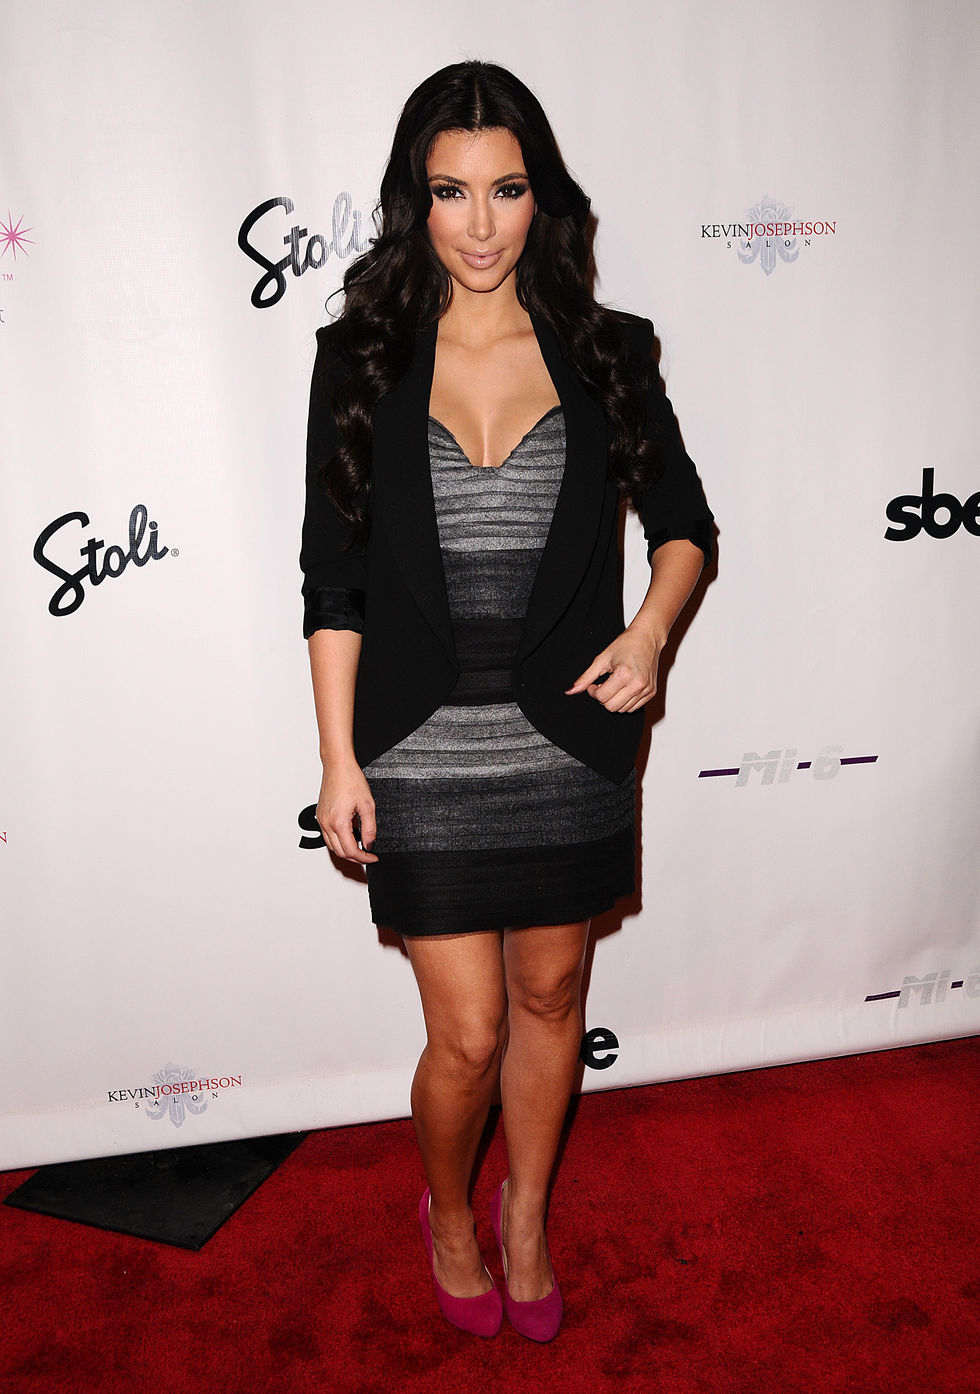 kim-kardashian--shows-cleavage-at-zeugari-fashion-show-01